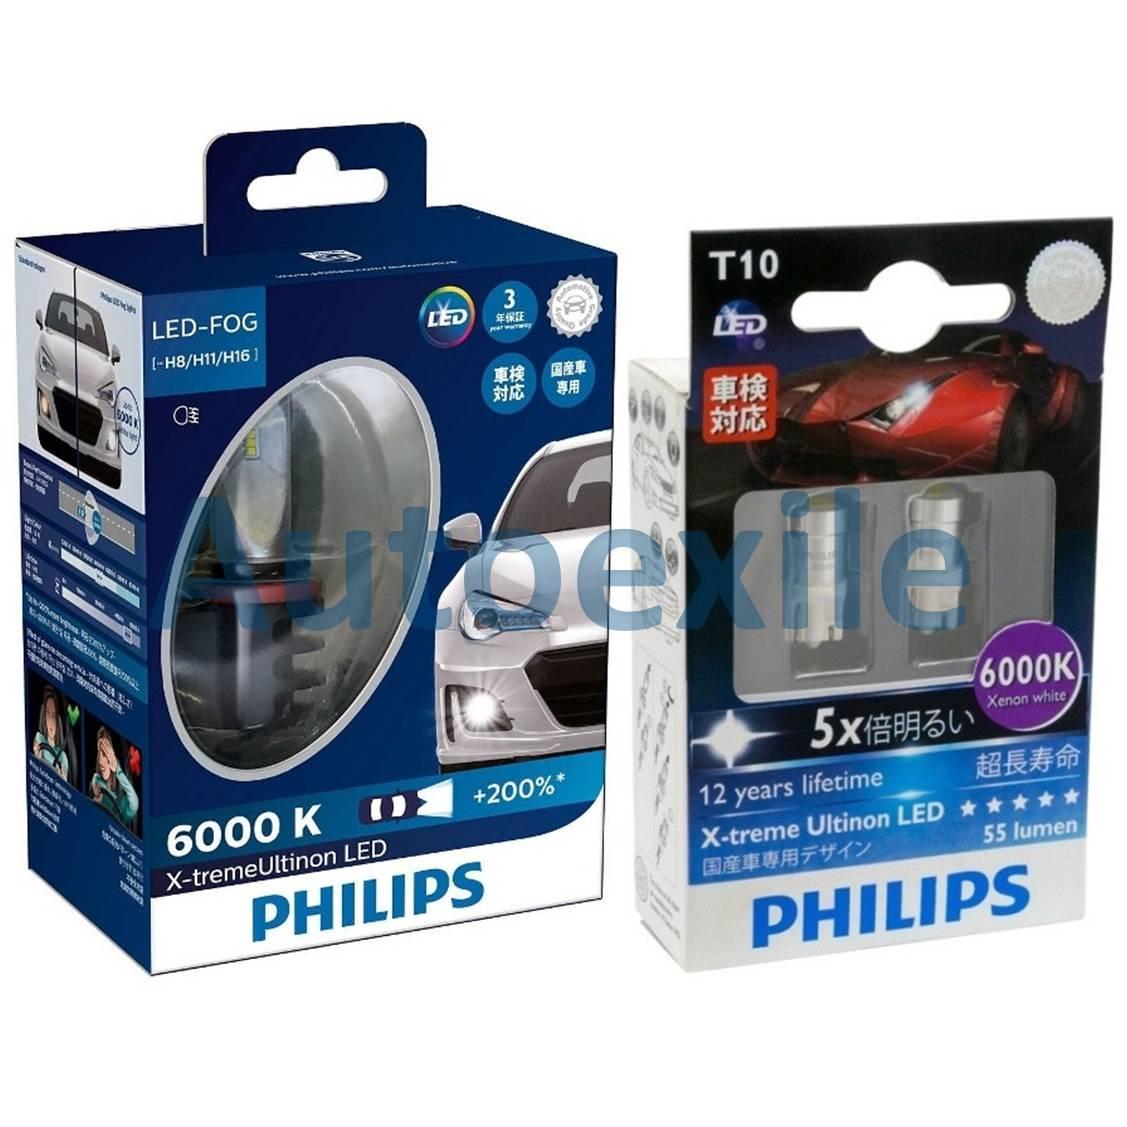 Paket Philips X-treme Ultinon LED H8 H11 H16 Lampu Depan Kabut dan Xtreme Ultinon T10 6000K Putih Lampu Senja Mobil